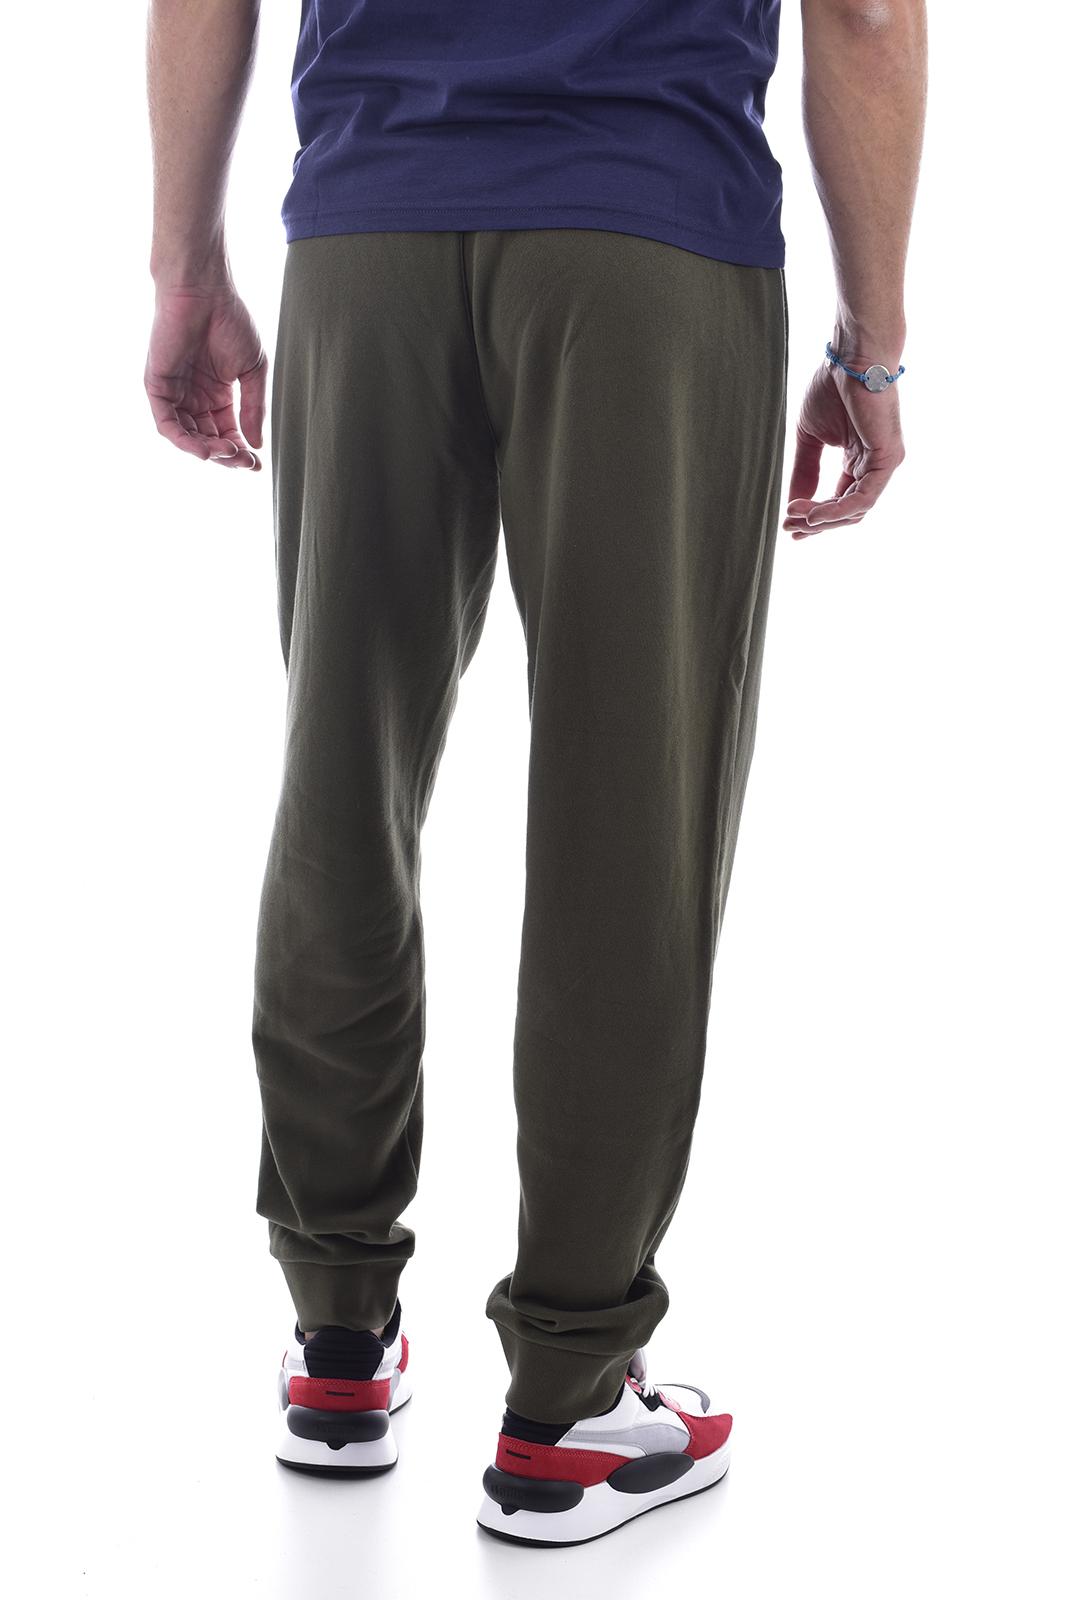 Pantalons sport/streetwear  Emporio armani 111869 0A560 7581 kaki